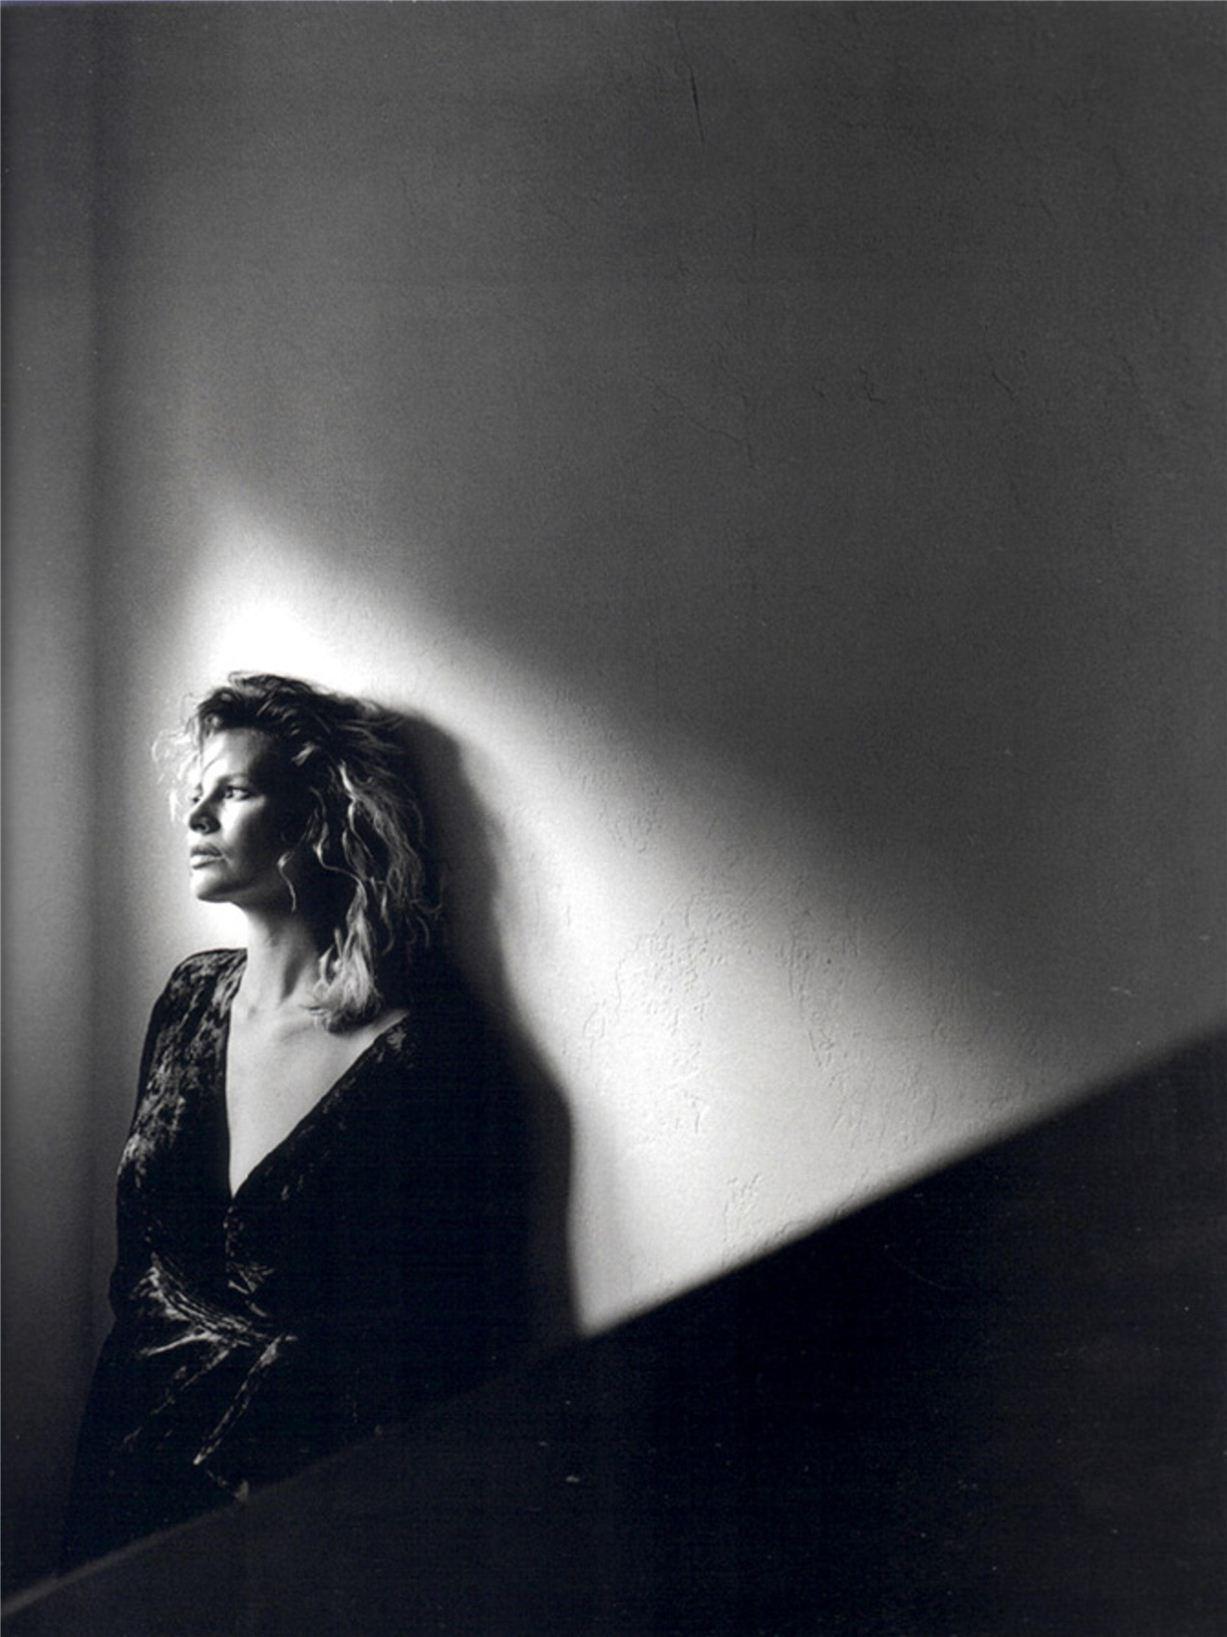 Kim Basinger / Ким Бейсингер - портрет фотографа Грега Гормана / Greg Gorman